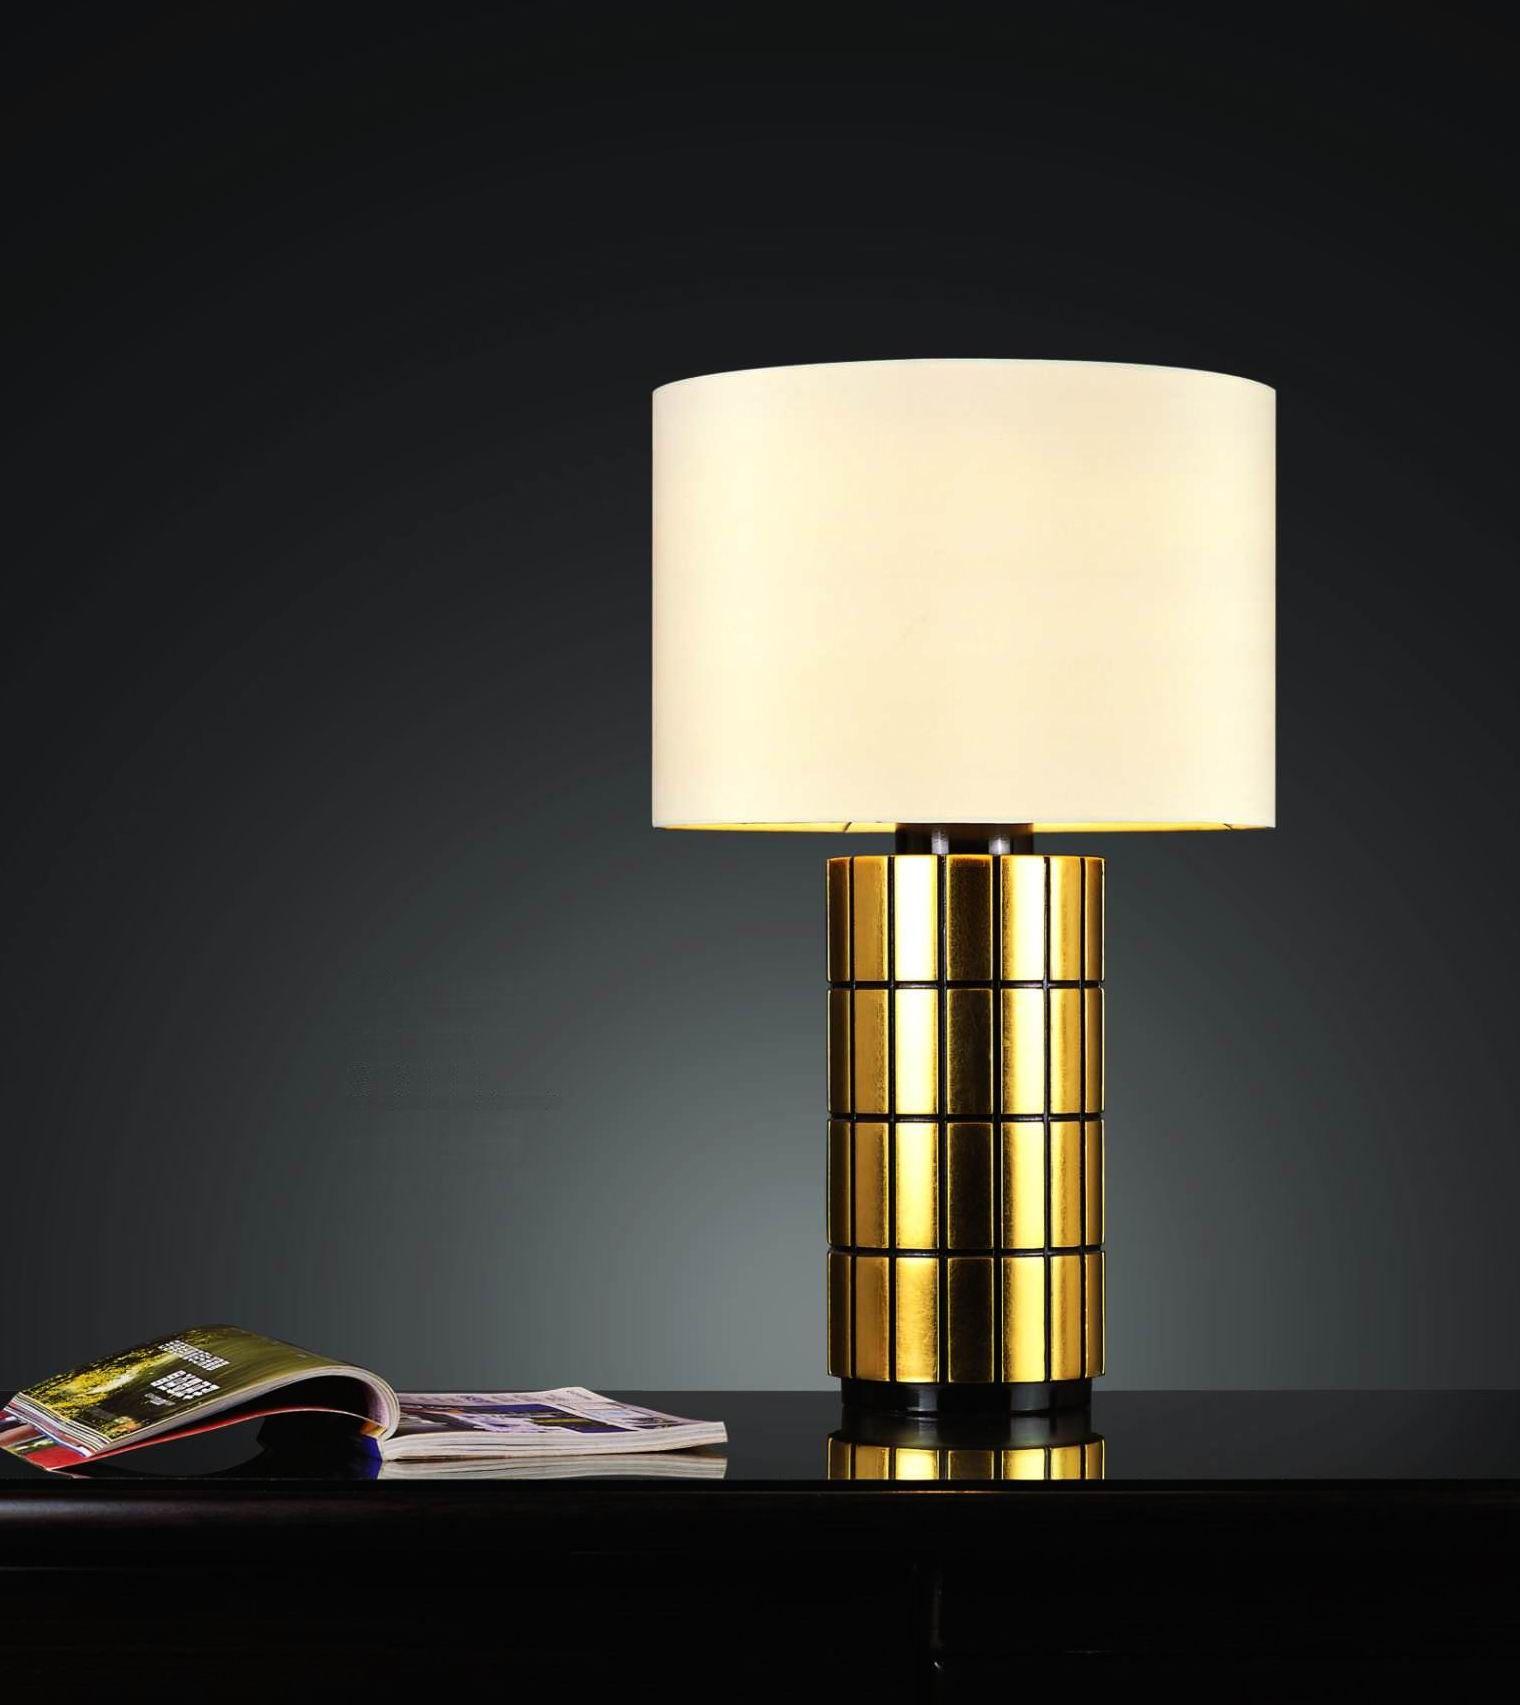 Glass Table Lamp Find More Inspirations: Www.luxxu.net #luxurylighting  #lightingdesign